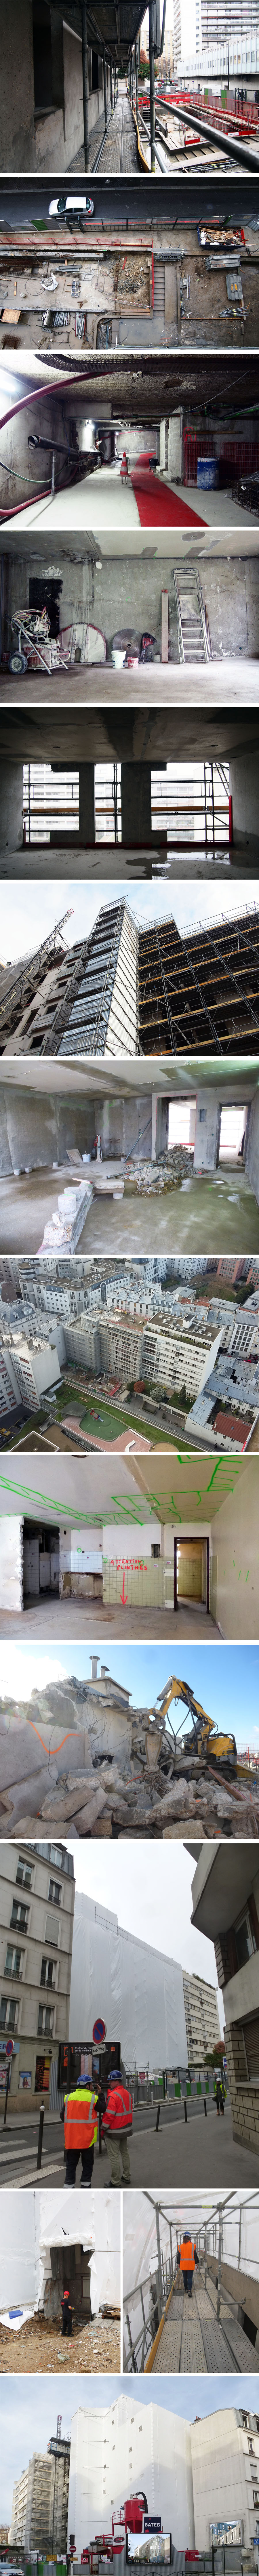 PERIPHERIQUES ARCHITECTES RESIDENCE SOCIALE